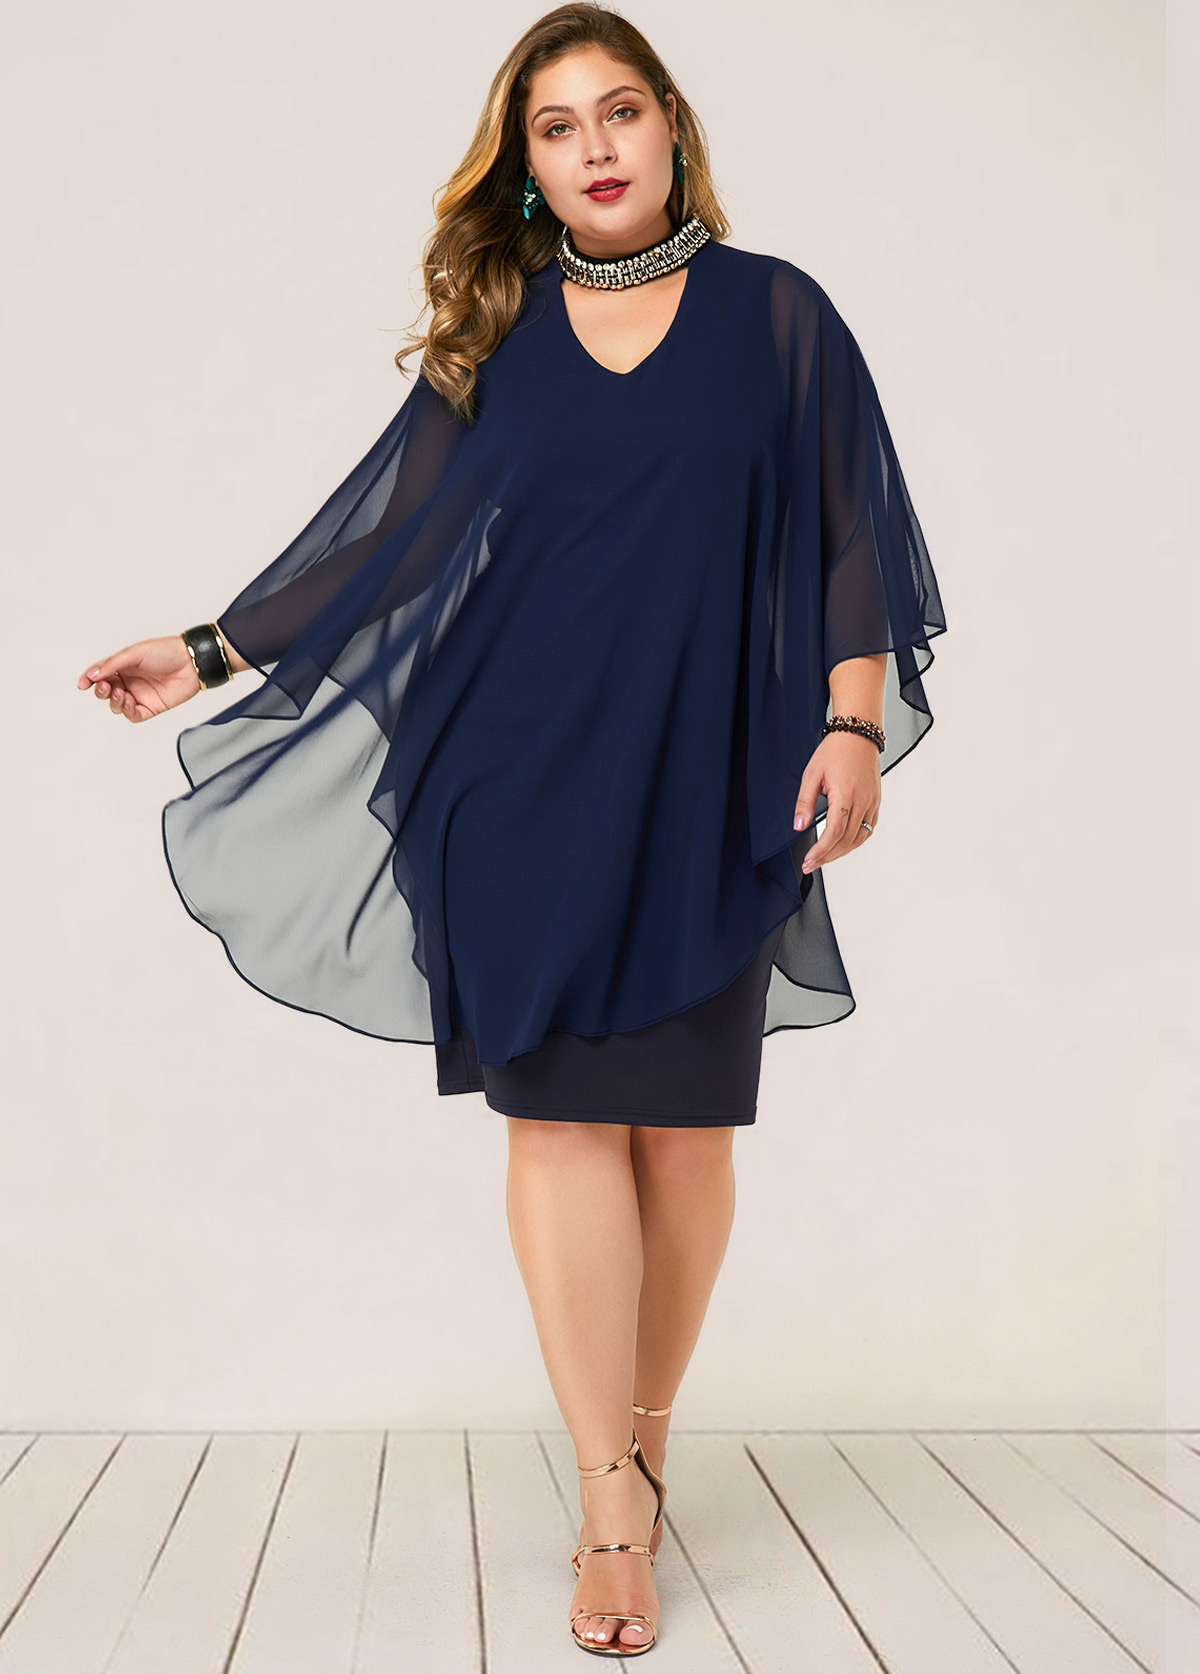 ROTITA Plus Size Embellished Neck Faux Two Piece Dress